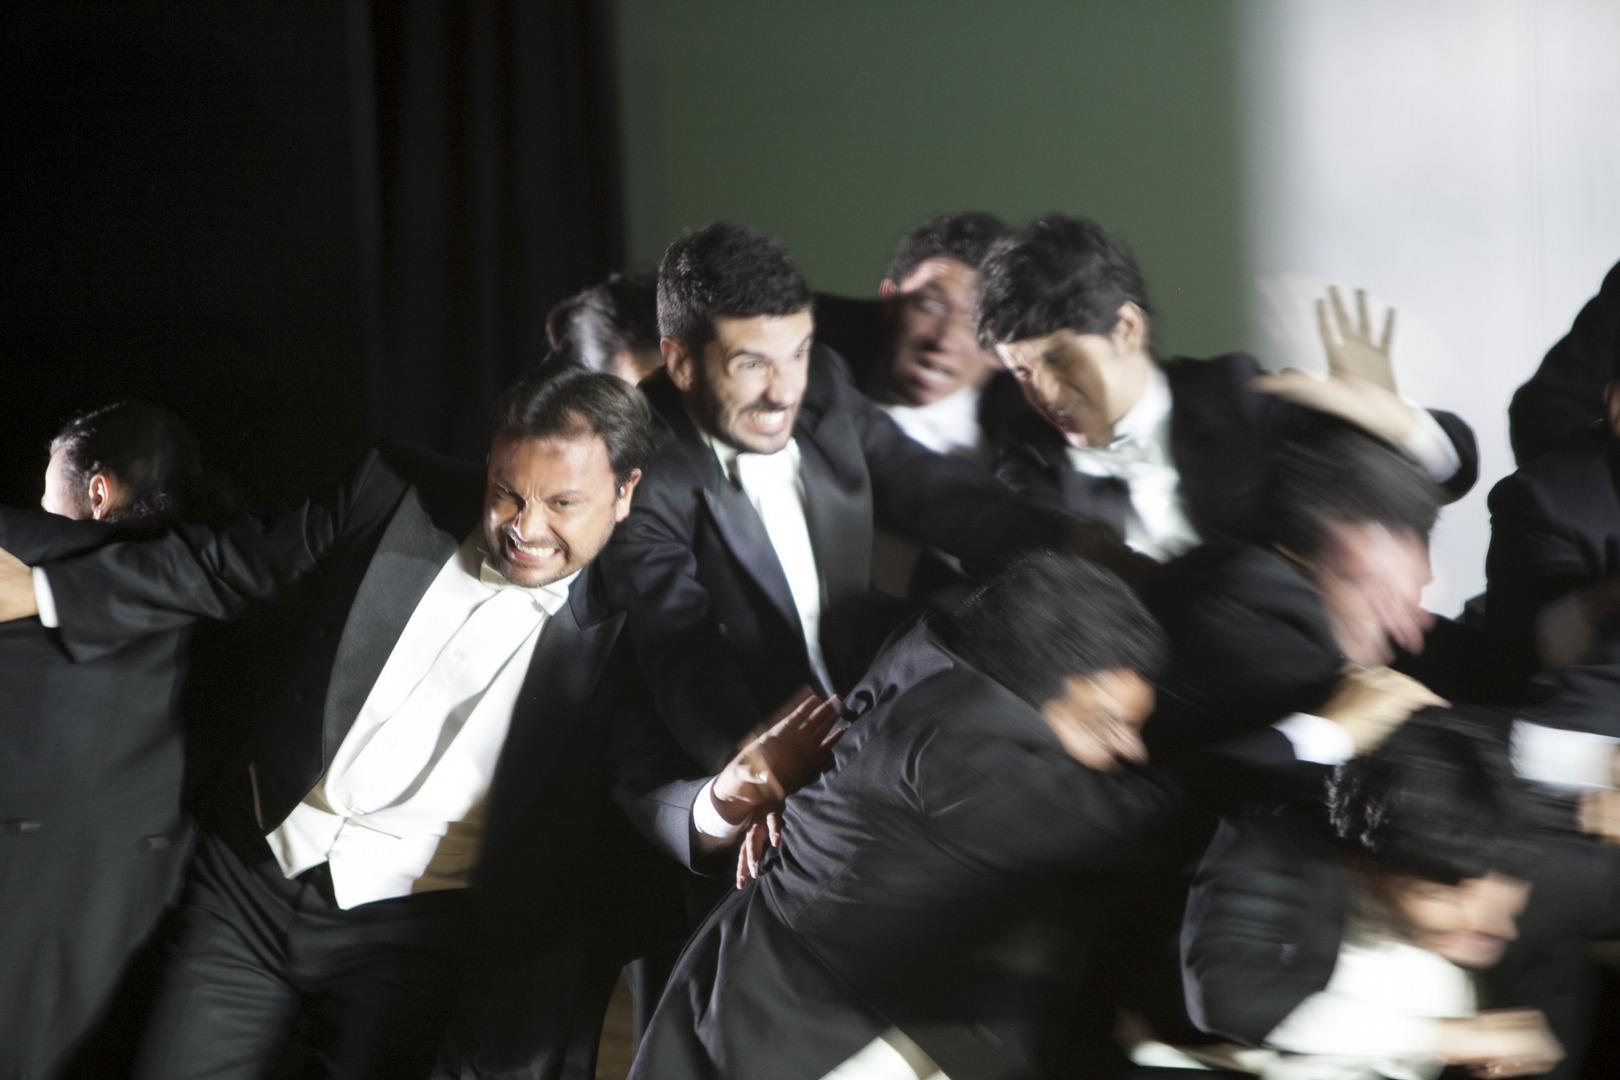 Cenerentola-Opera-Stage-Director-Jacopo-Spirei-scene